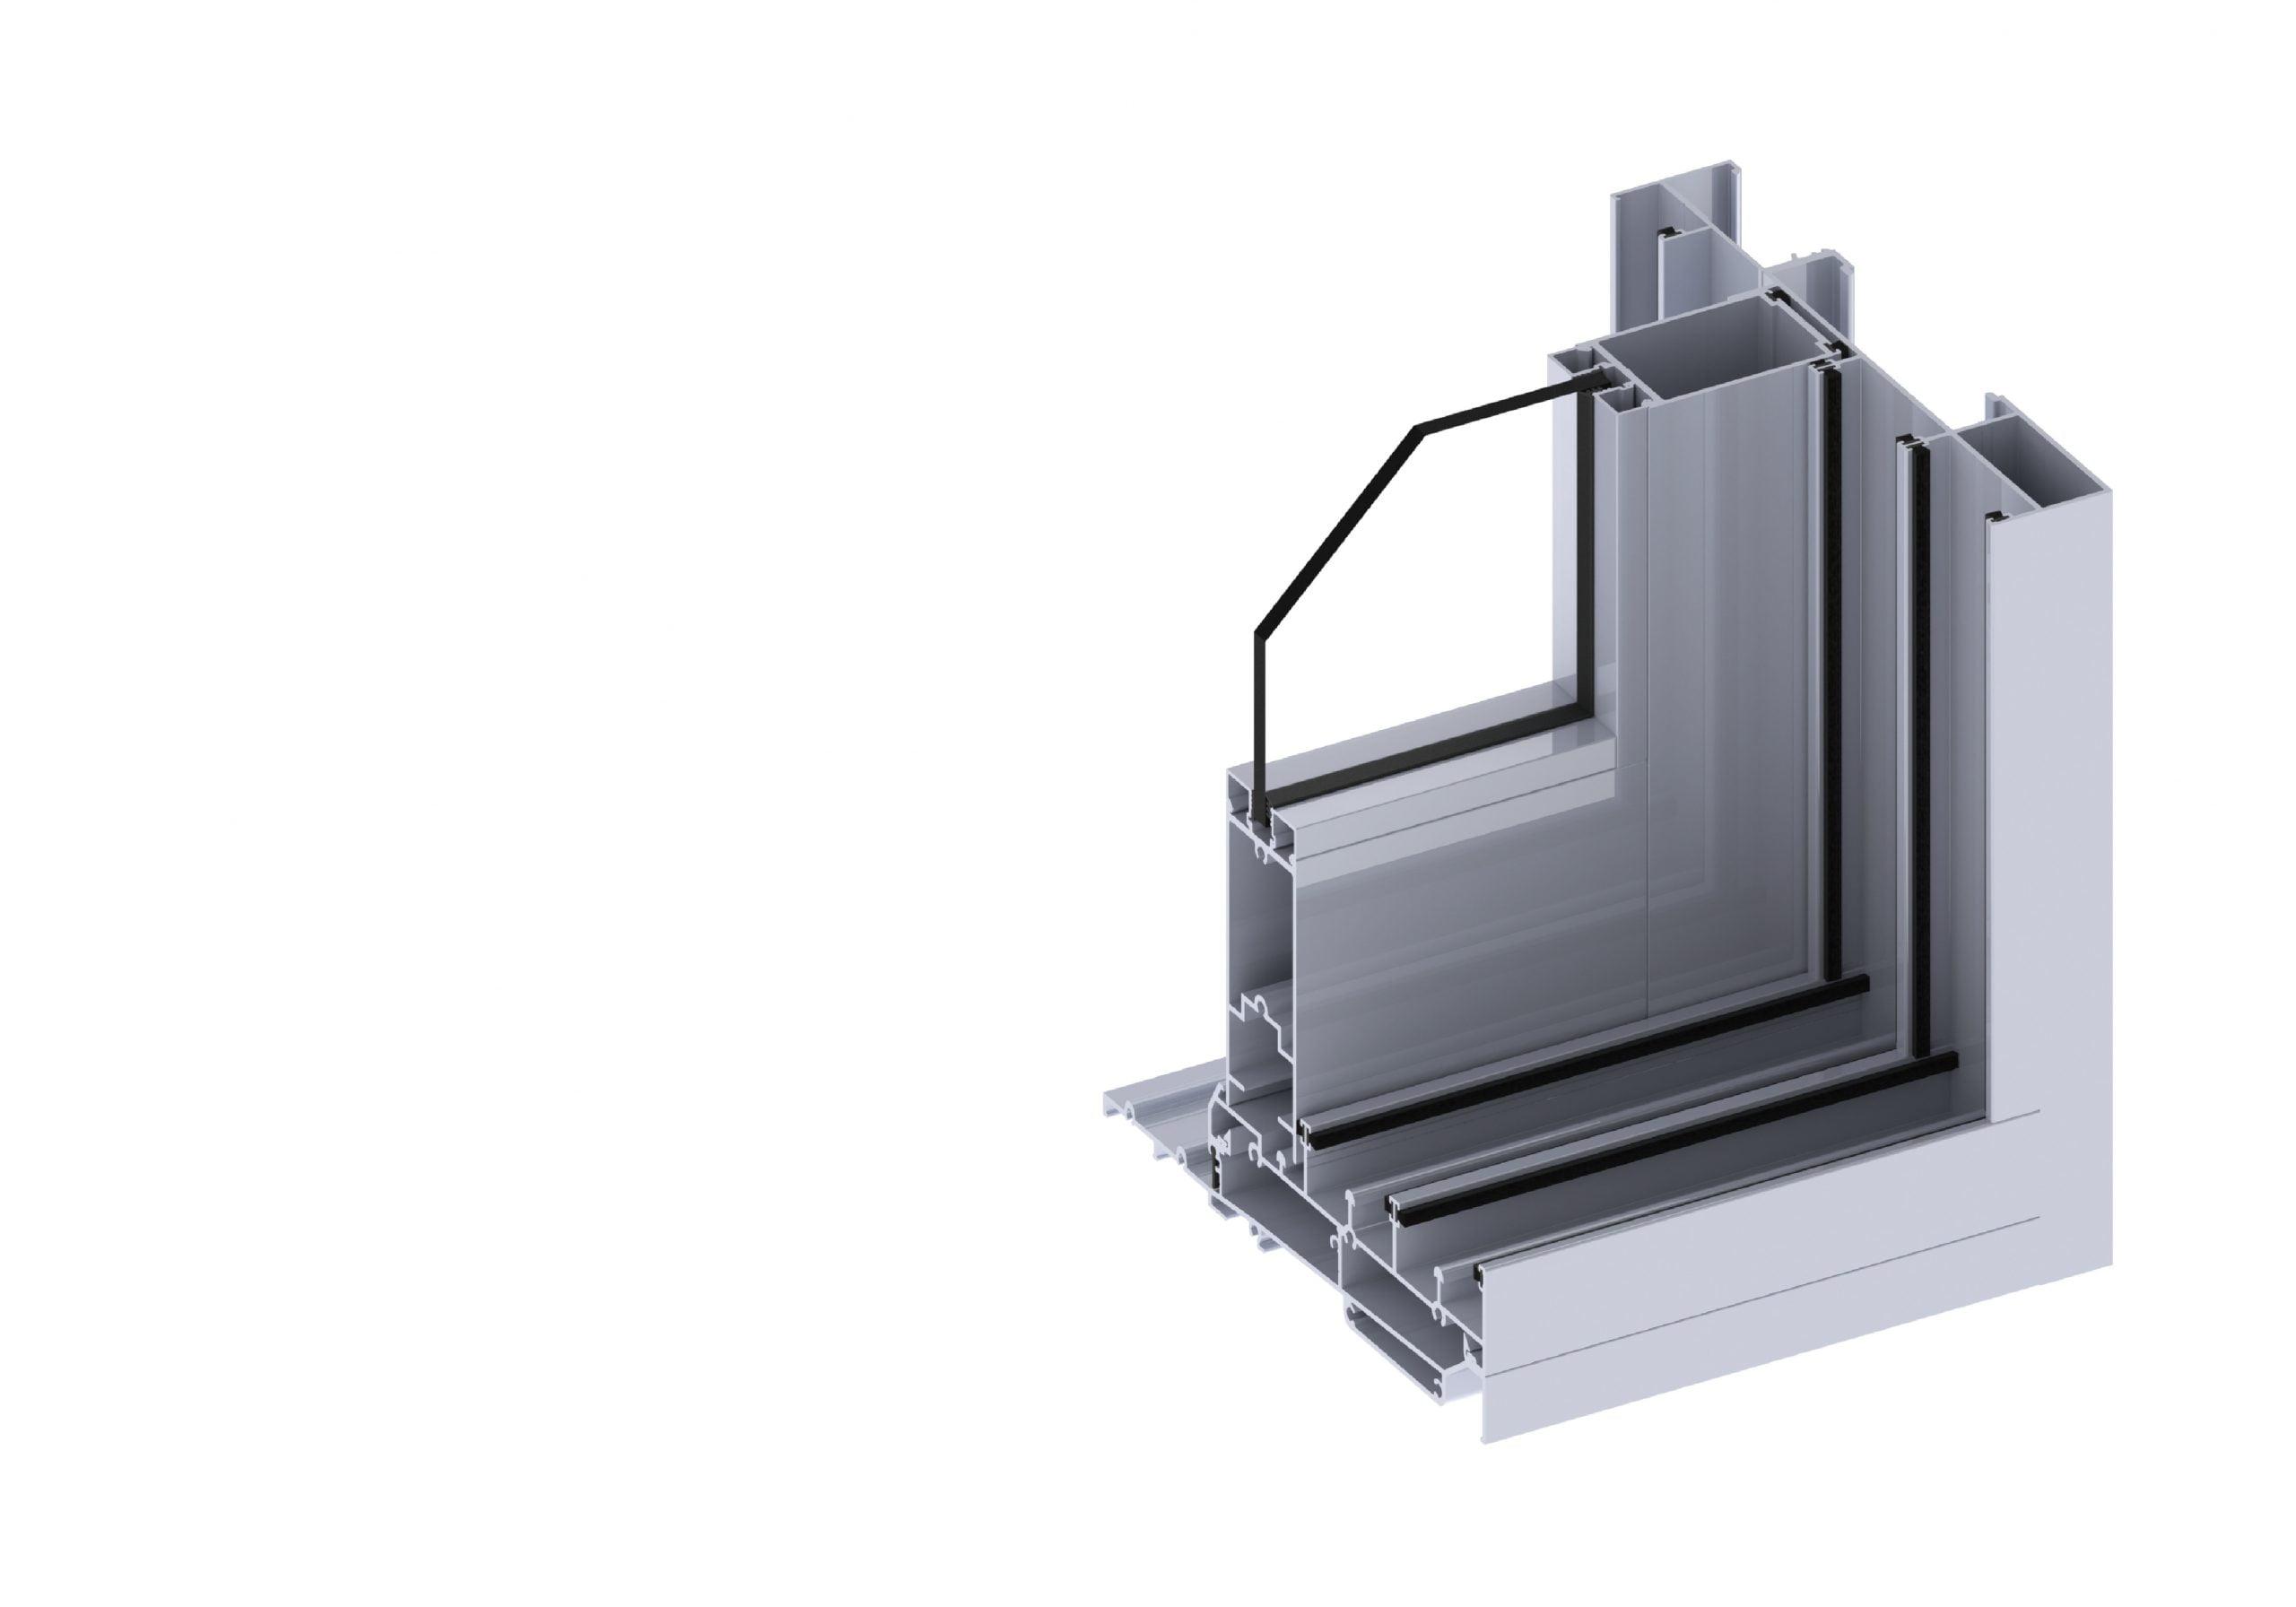 Paragon cavity door section